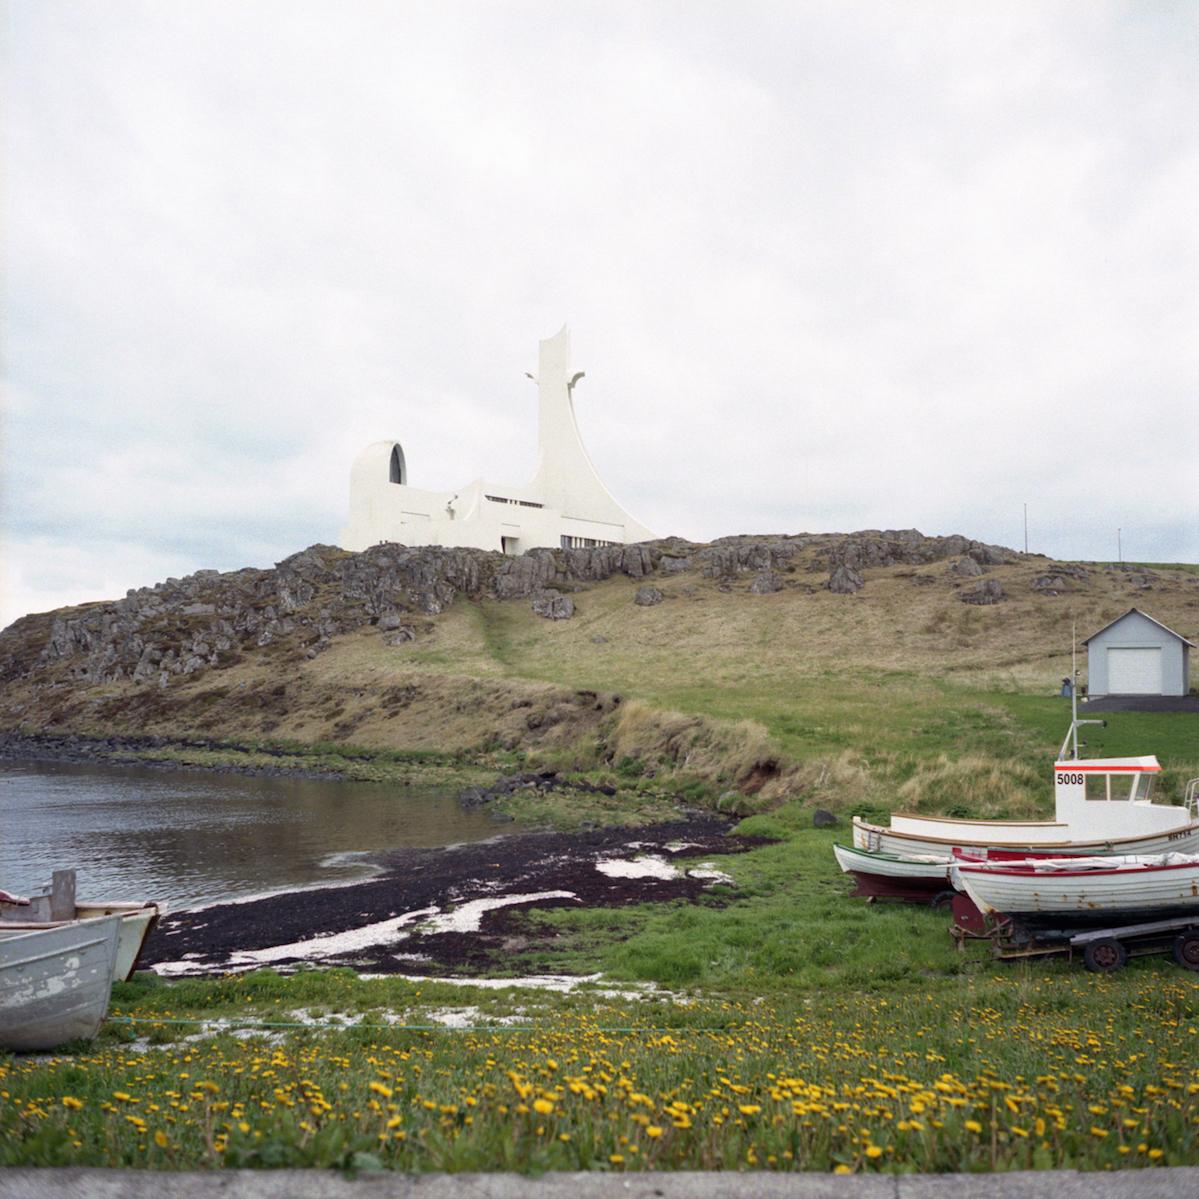 Islande2013_056 - copie.jpg